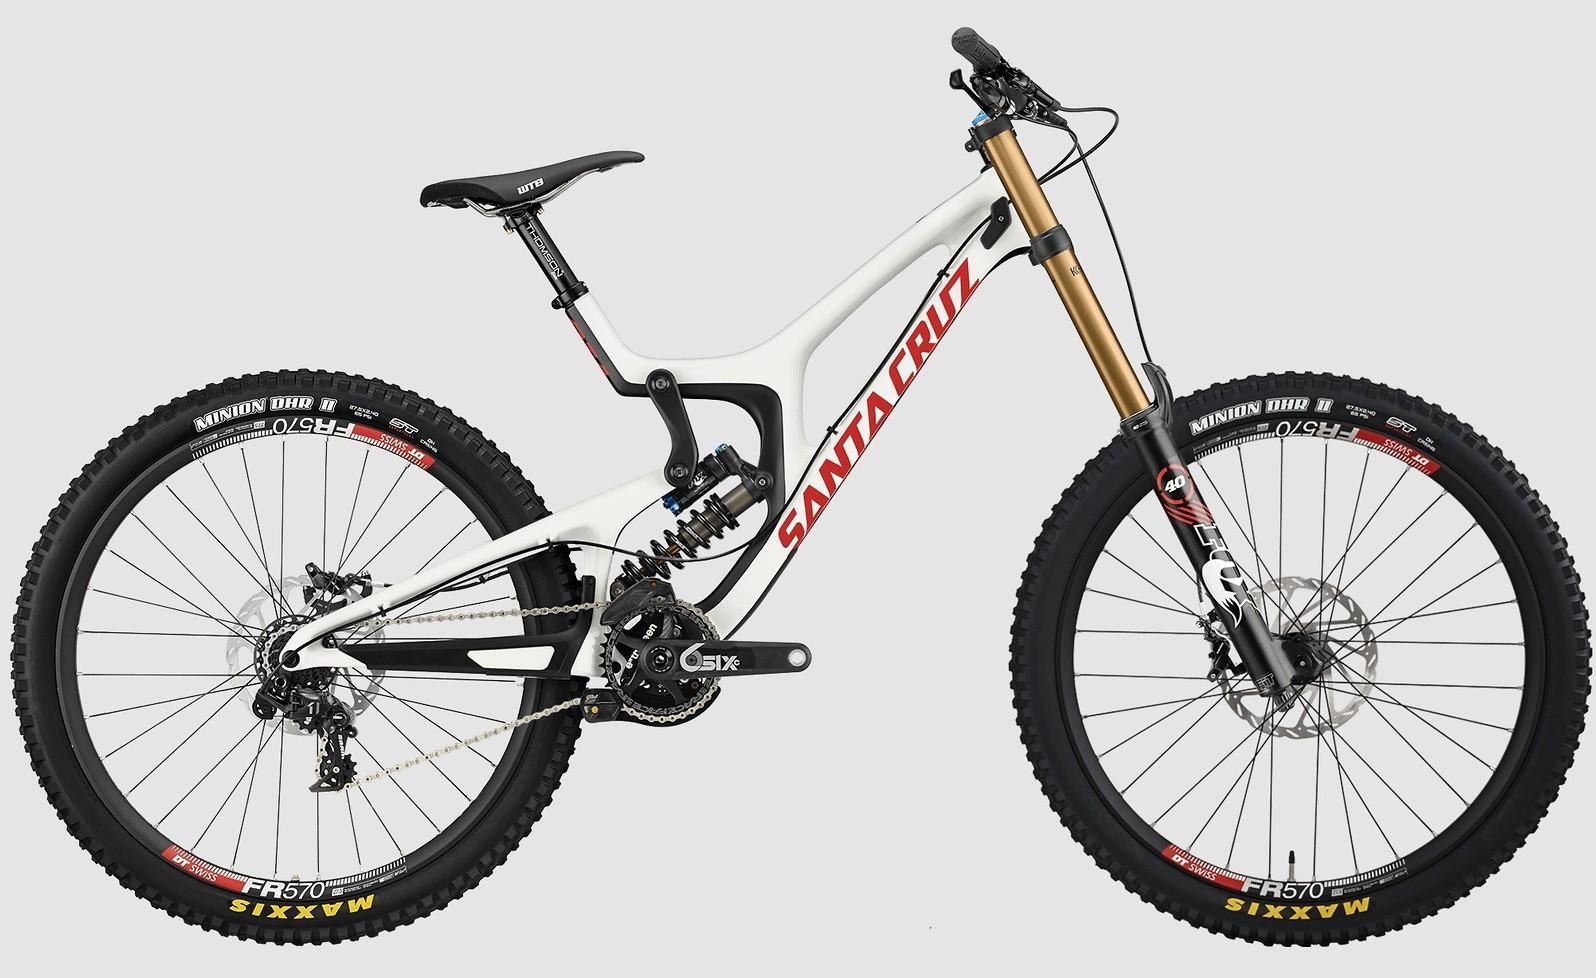 2015 Santa Cruz V10 Carbon CC X01 - white:red